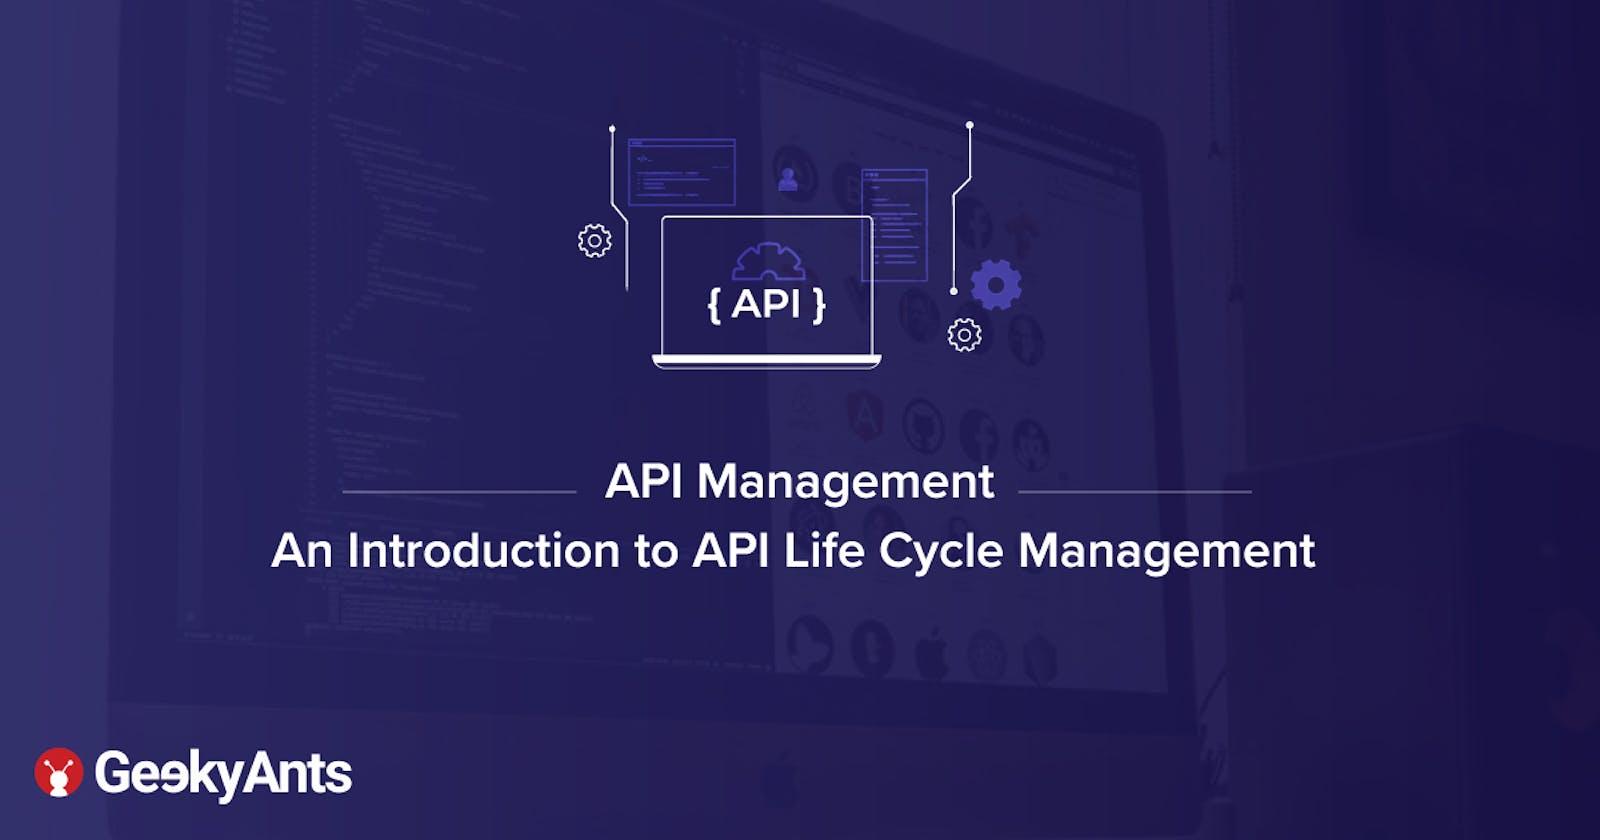 API Management Part 1 - An Introduction to API Life Cycle Management